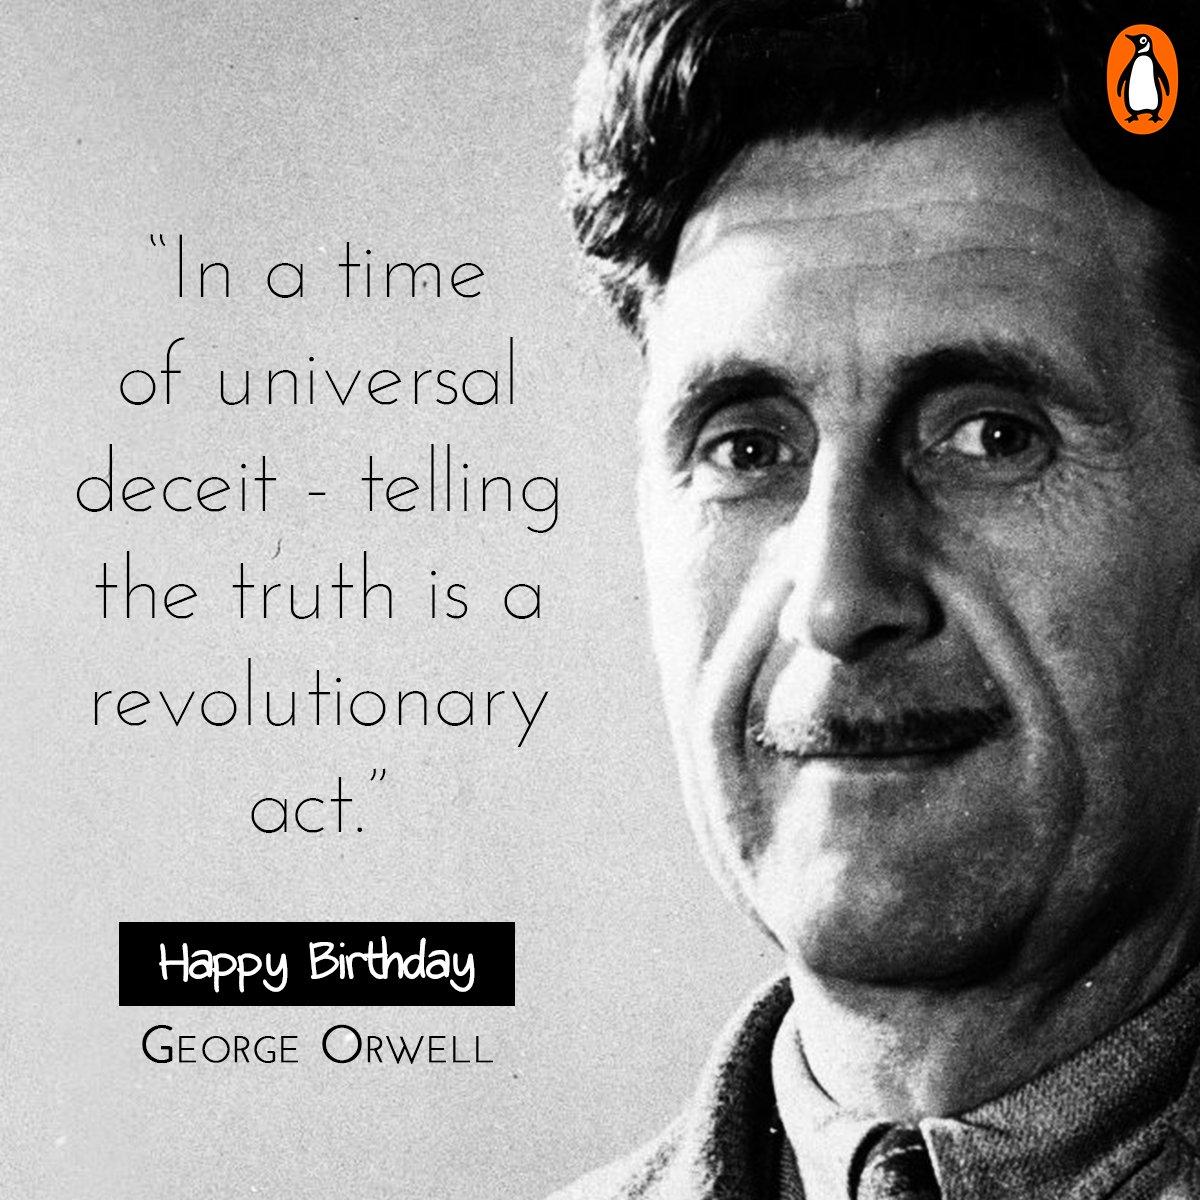 Happy birthday, George Orwell! https://t.co/gWnIPyZAIT